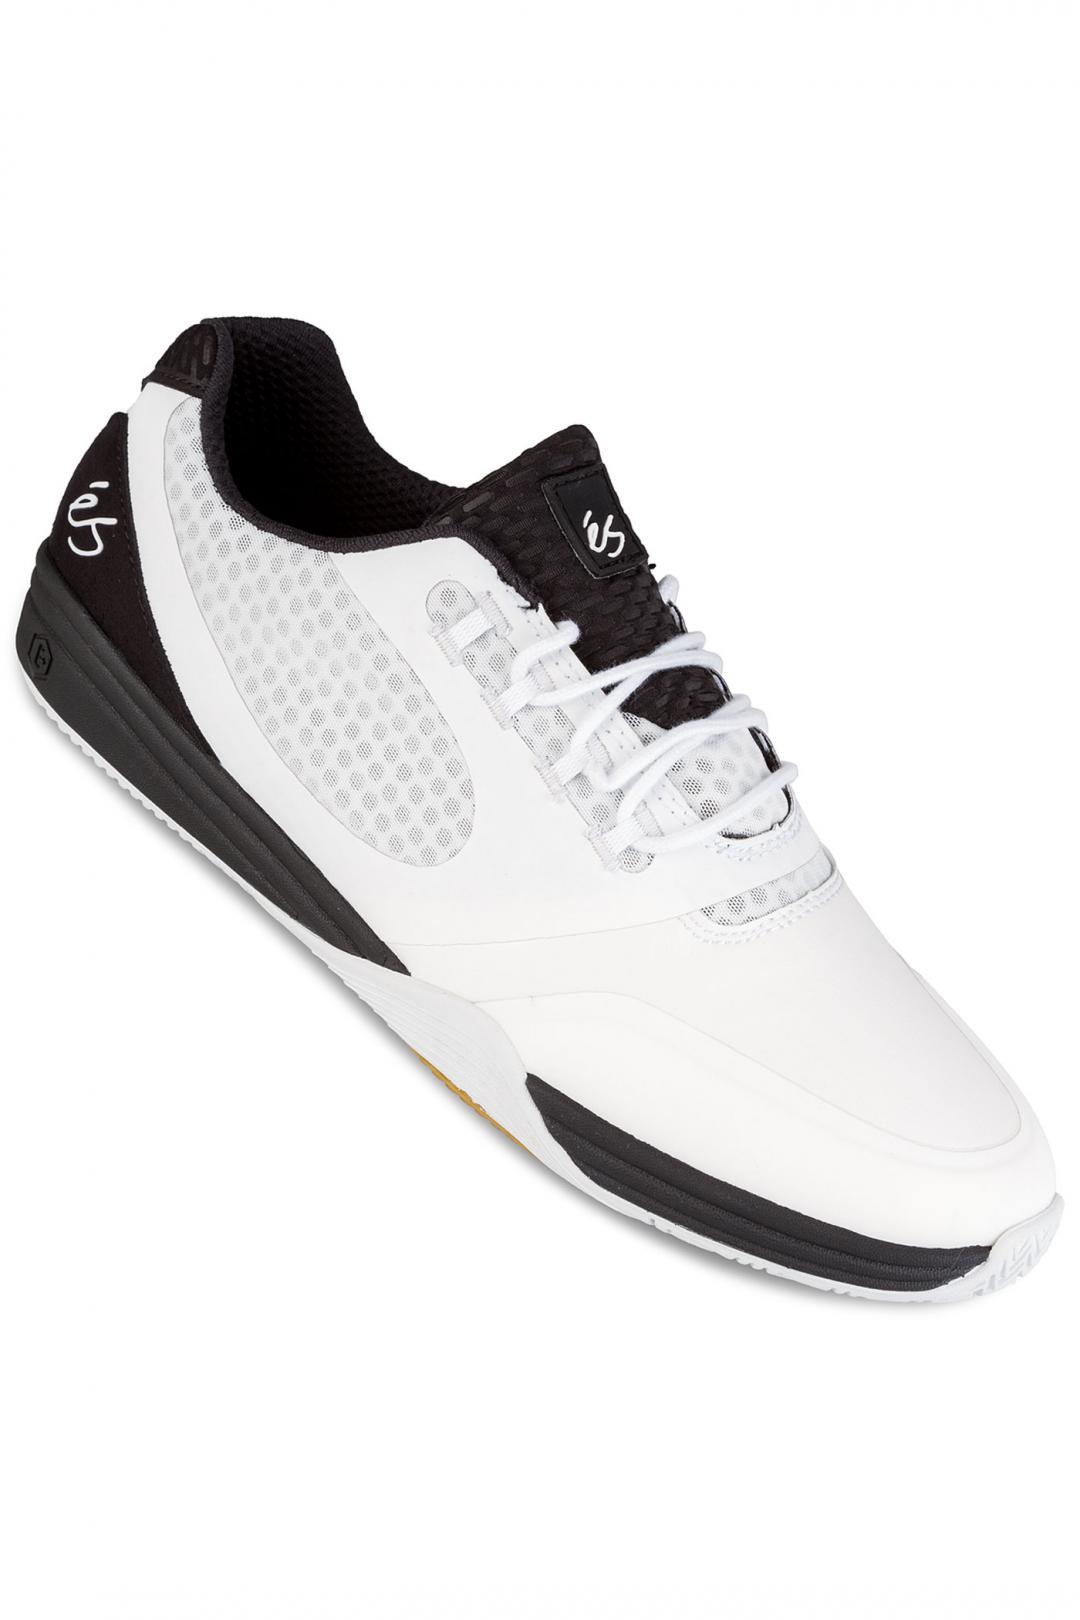 Uomo éS Sesla white black | Sneaker